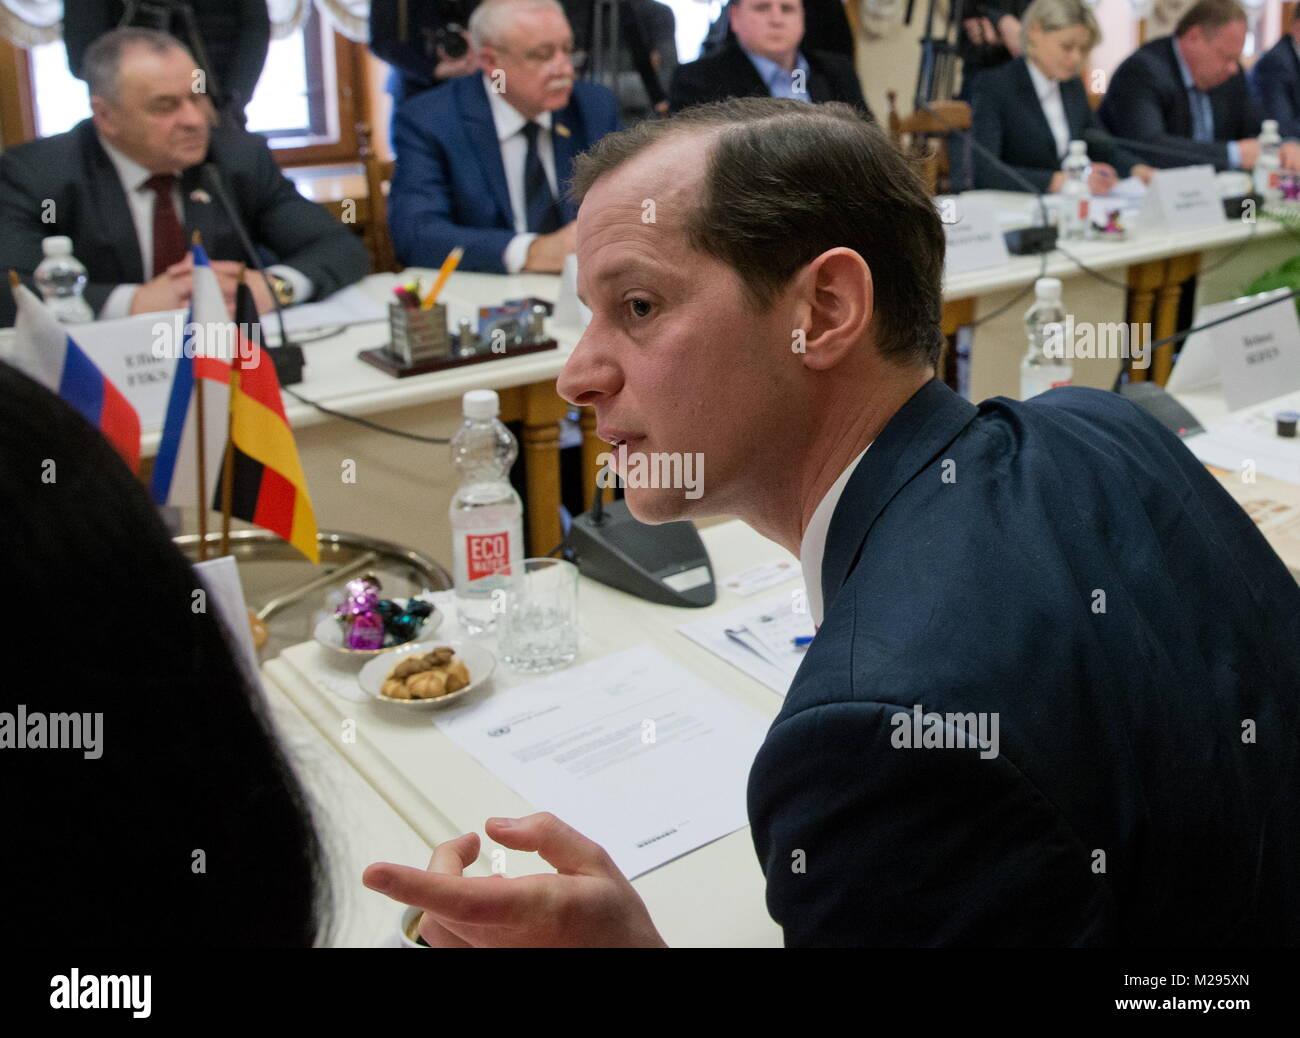 Simferopol, Russia. 06th Feb, 2018. SIMFEROPOL, RUSSIA - FEBRUARY 6, 2018: Roger Beckamp, member of North Rhine - Stock Image